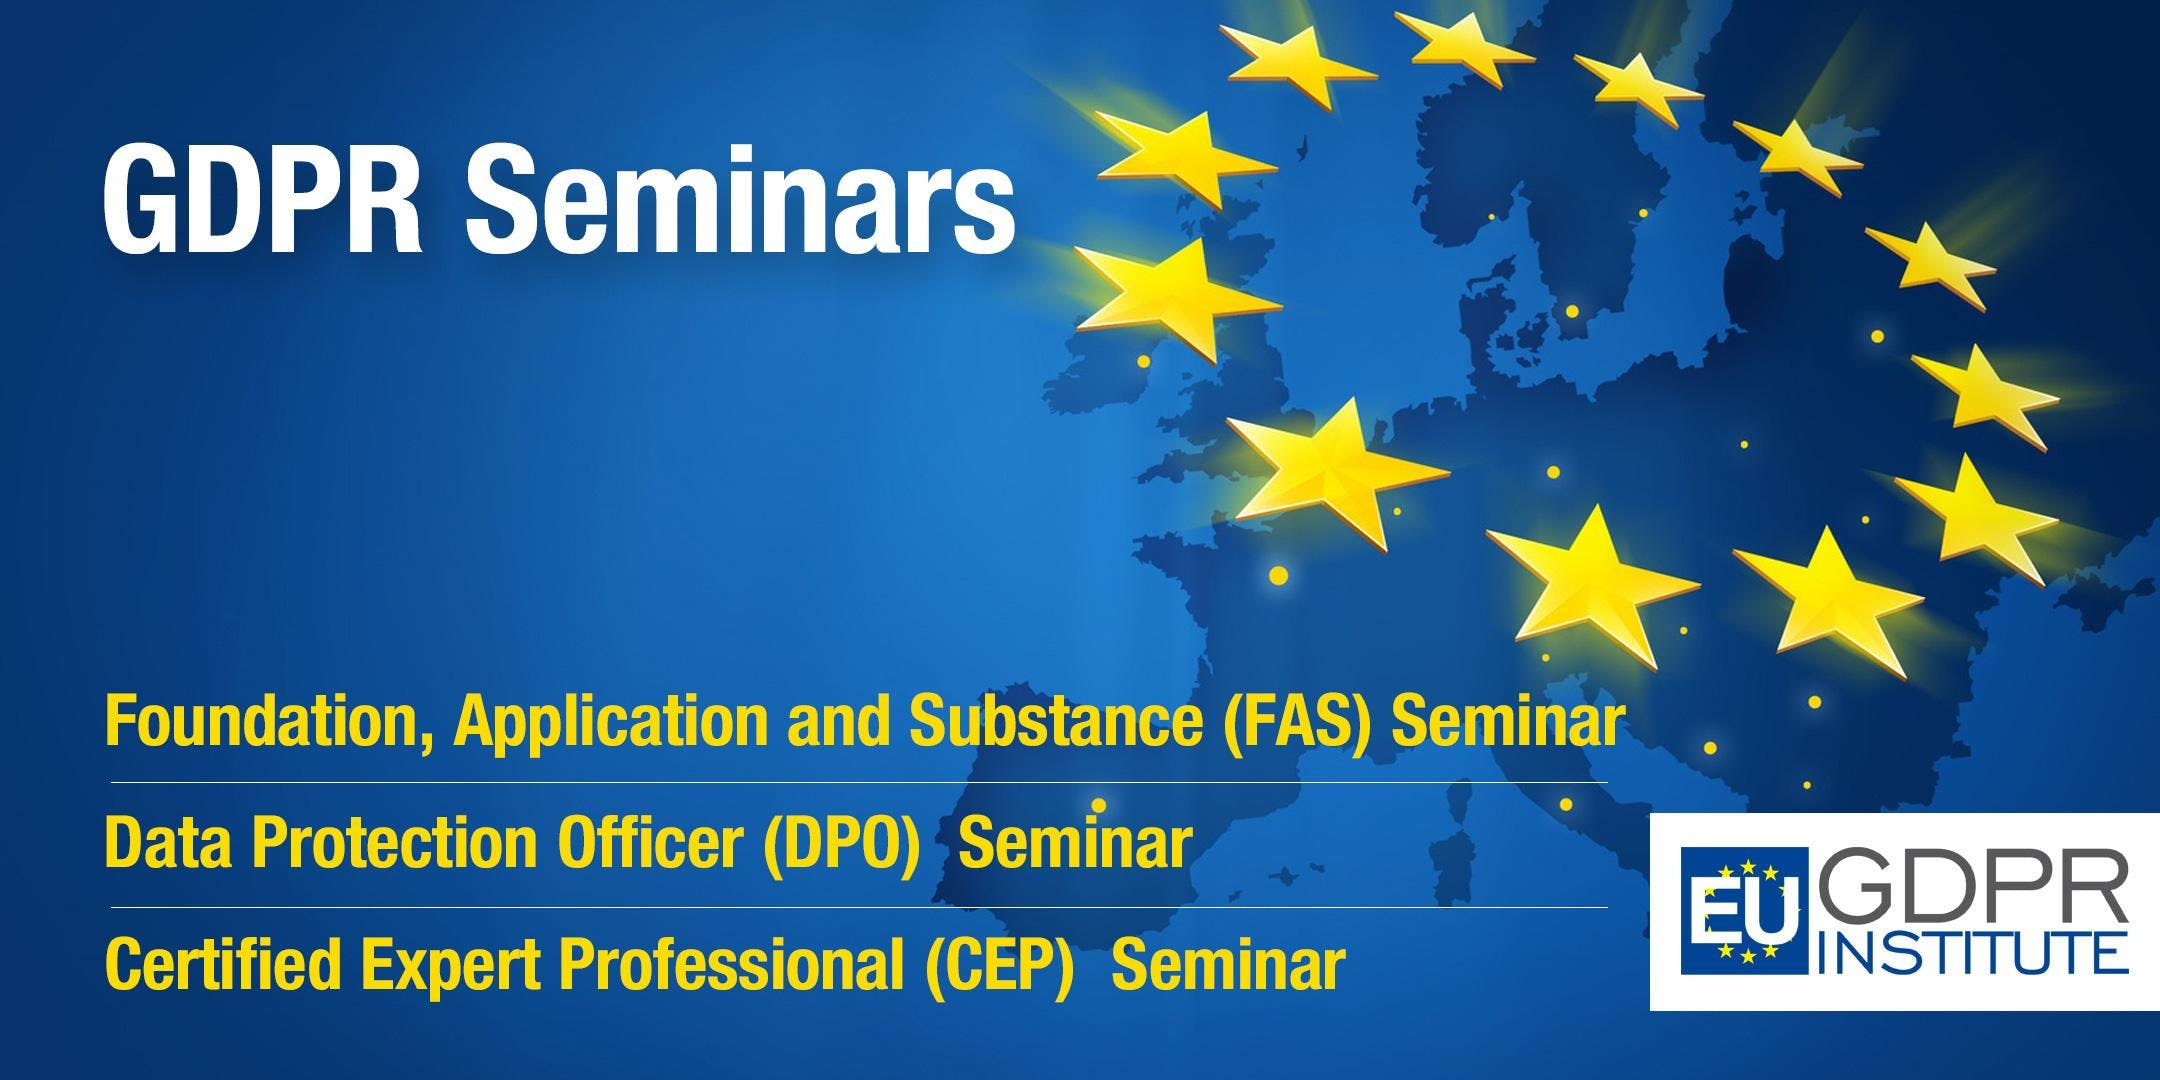 Gdpr Seminar Fas Dpo Cep With Certific Berlin 110219